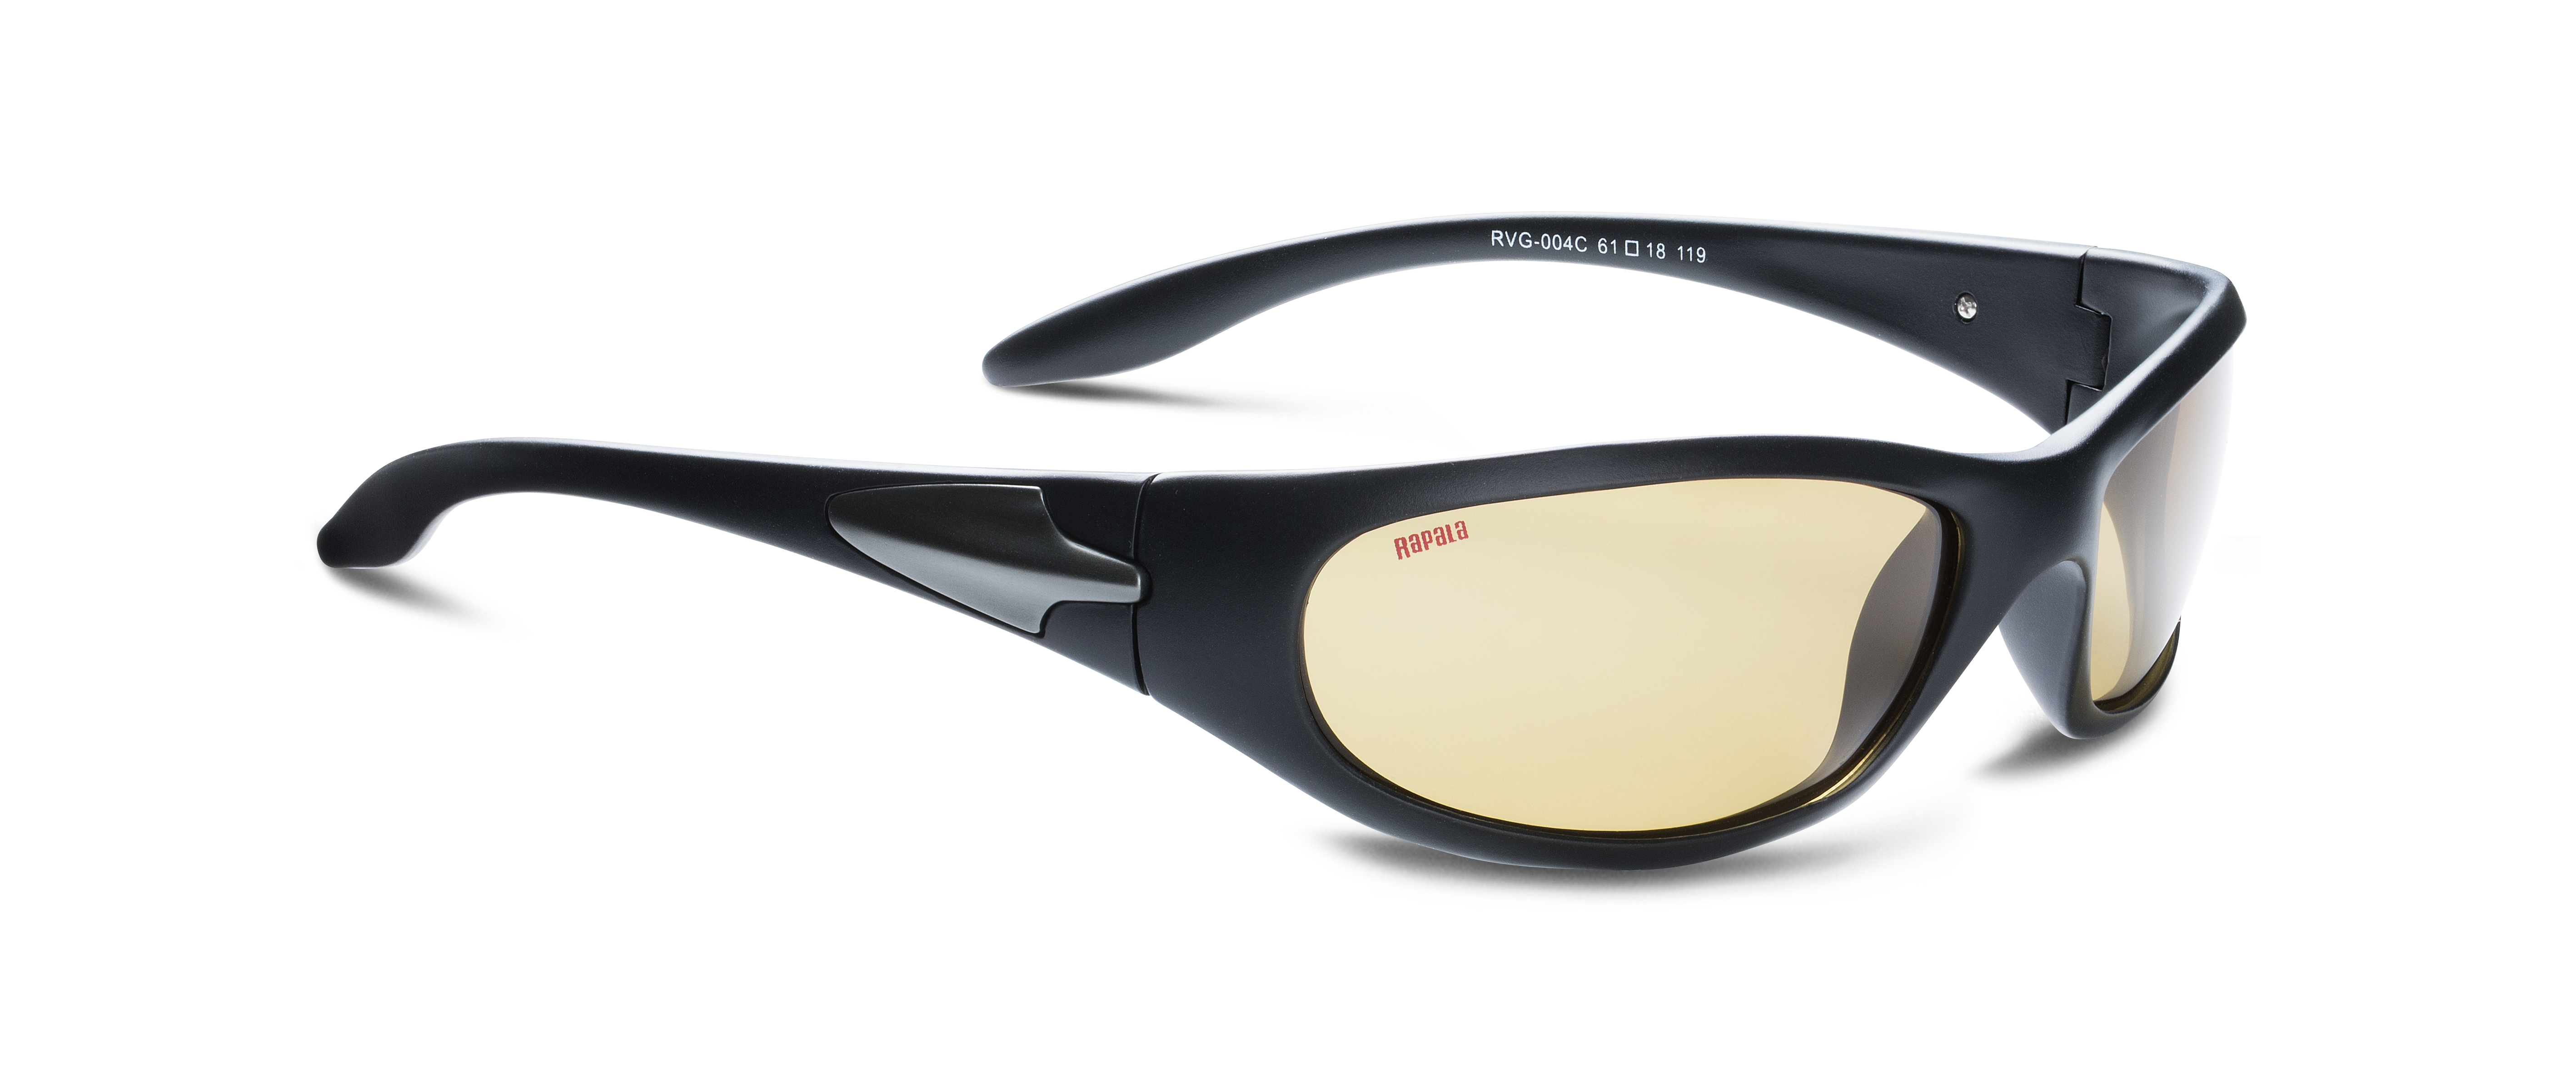 Фото - Очки Rapala Sportsman's RVG-004C набор 3d очки и подарочная упаковка lazy bows